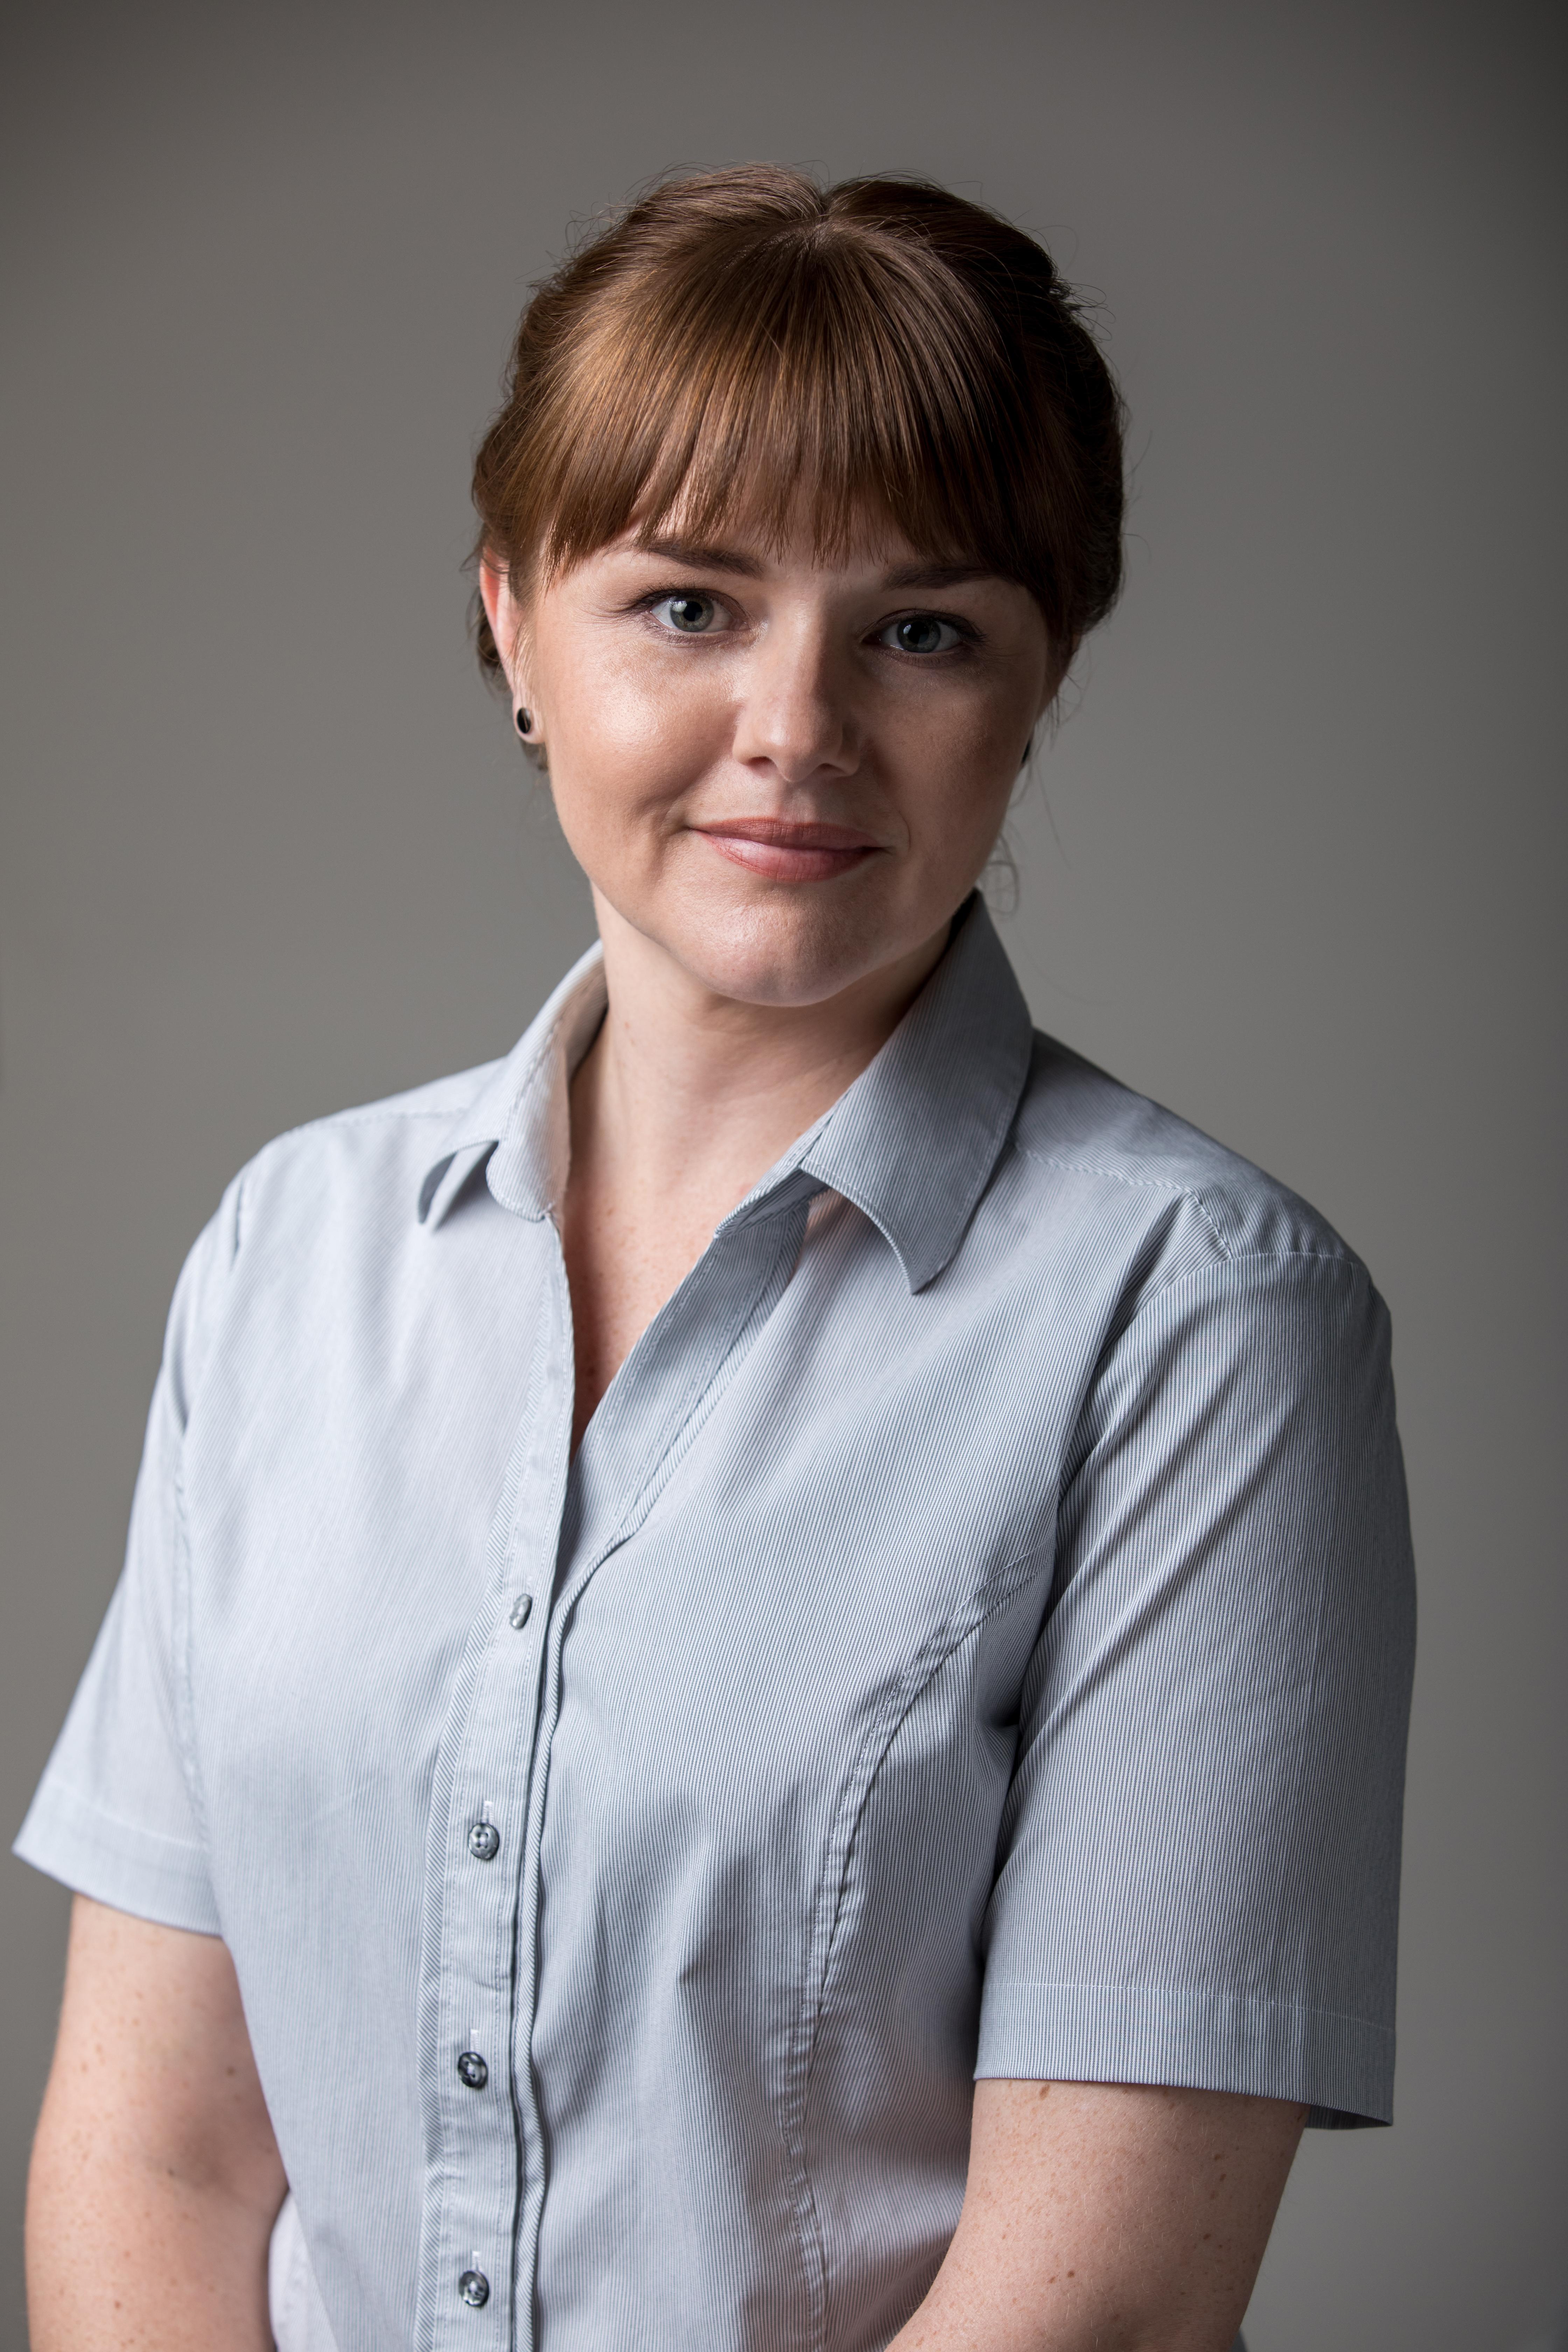 Shanice Duffy